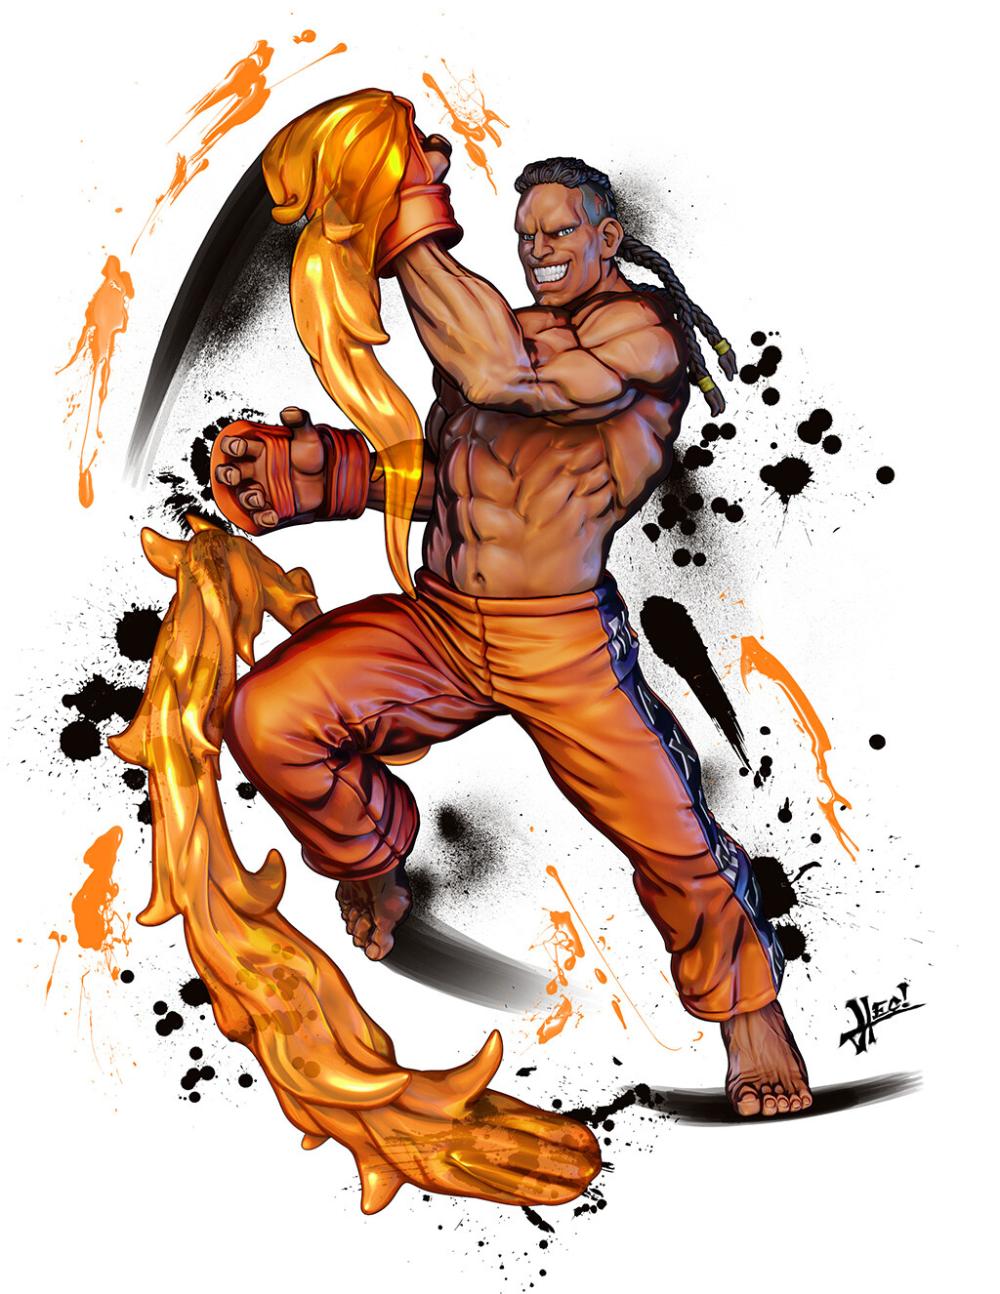 Artstation Street Fighter Miniatures Ssf2 New Challengers Pack Hector Moran Hec Street Fighter Characters Street Fighter Street Fighter Art